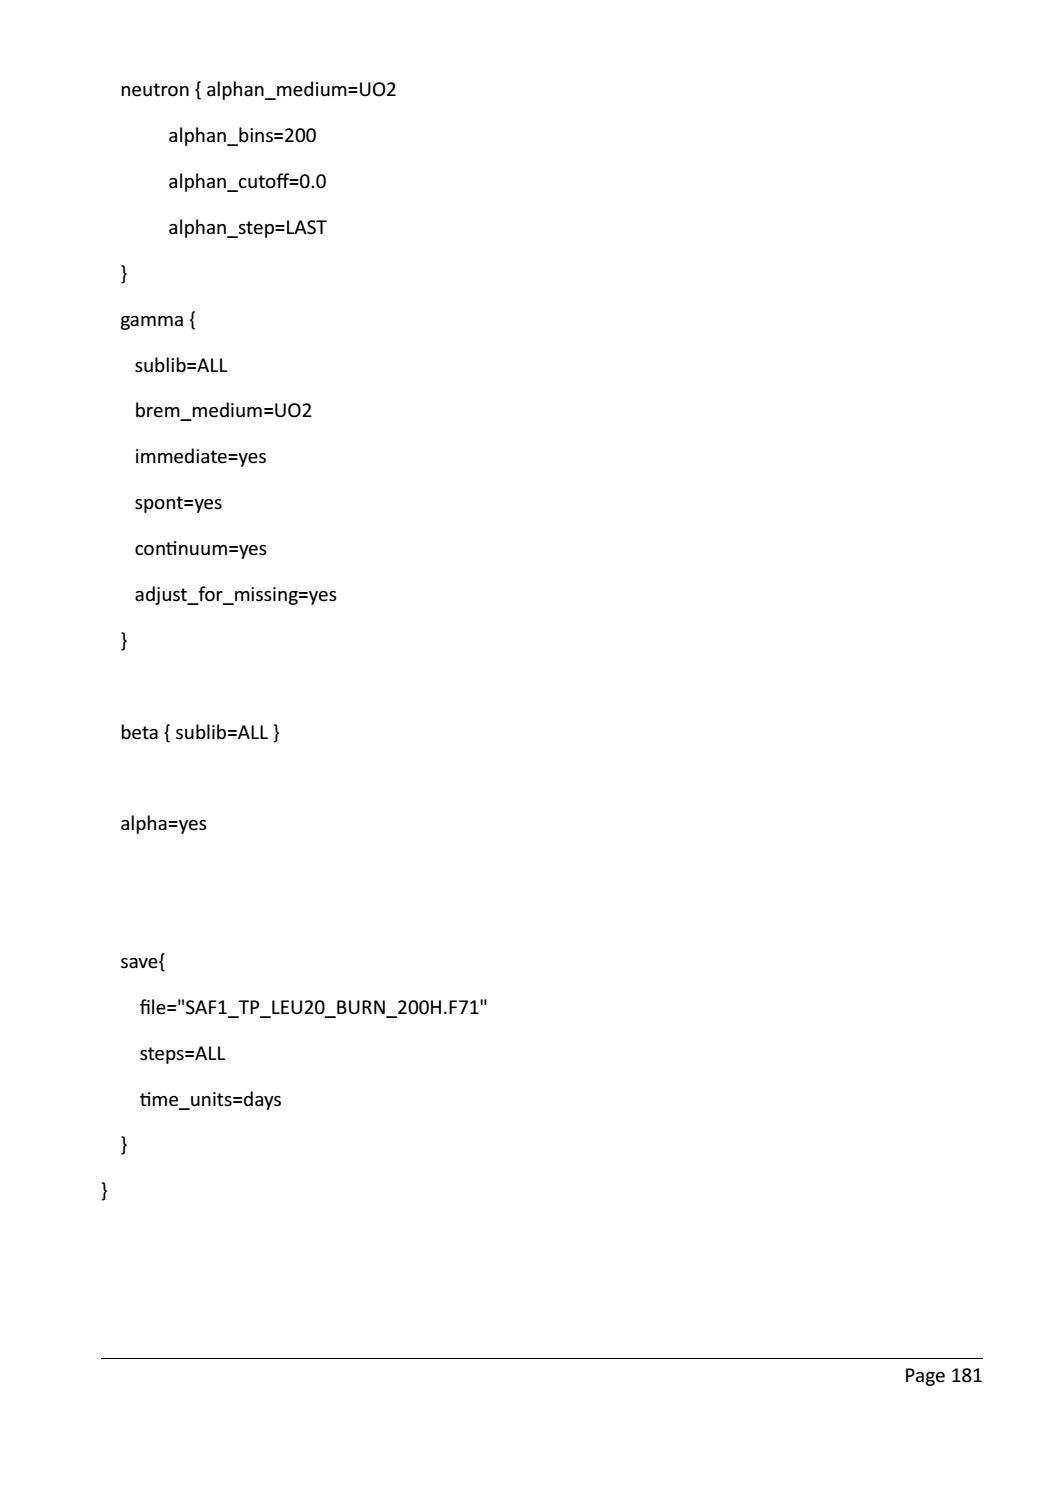 RADIOACTIVE WASTE: COMPUTATIONAL CHARACTERISATION and SHIELDING page 206